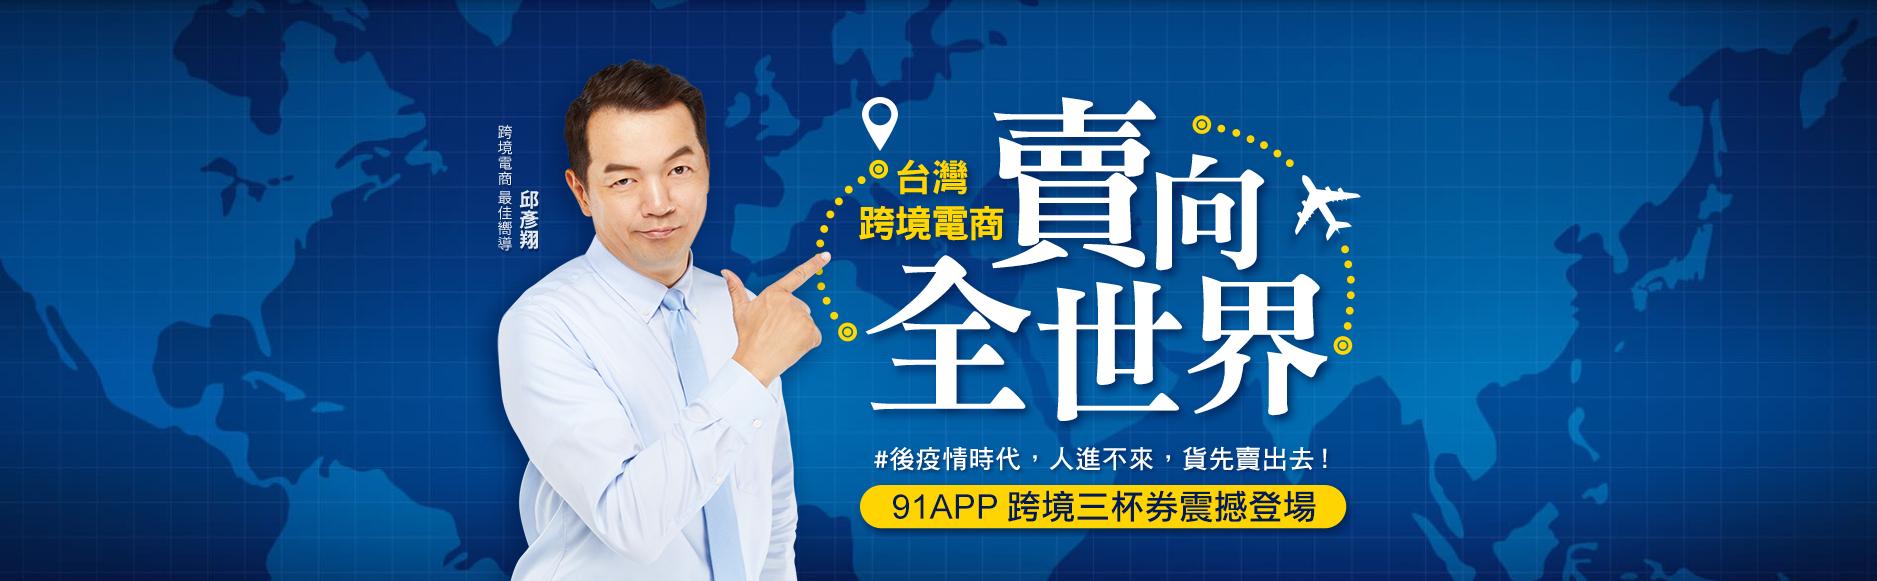 91APP 跨境電商